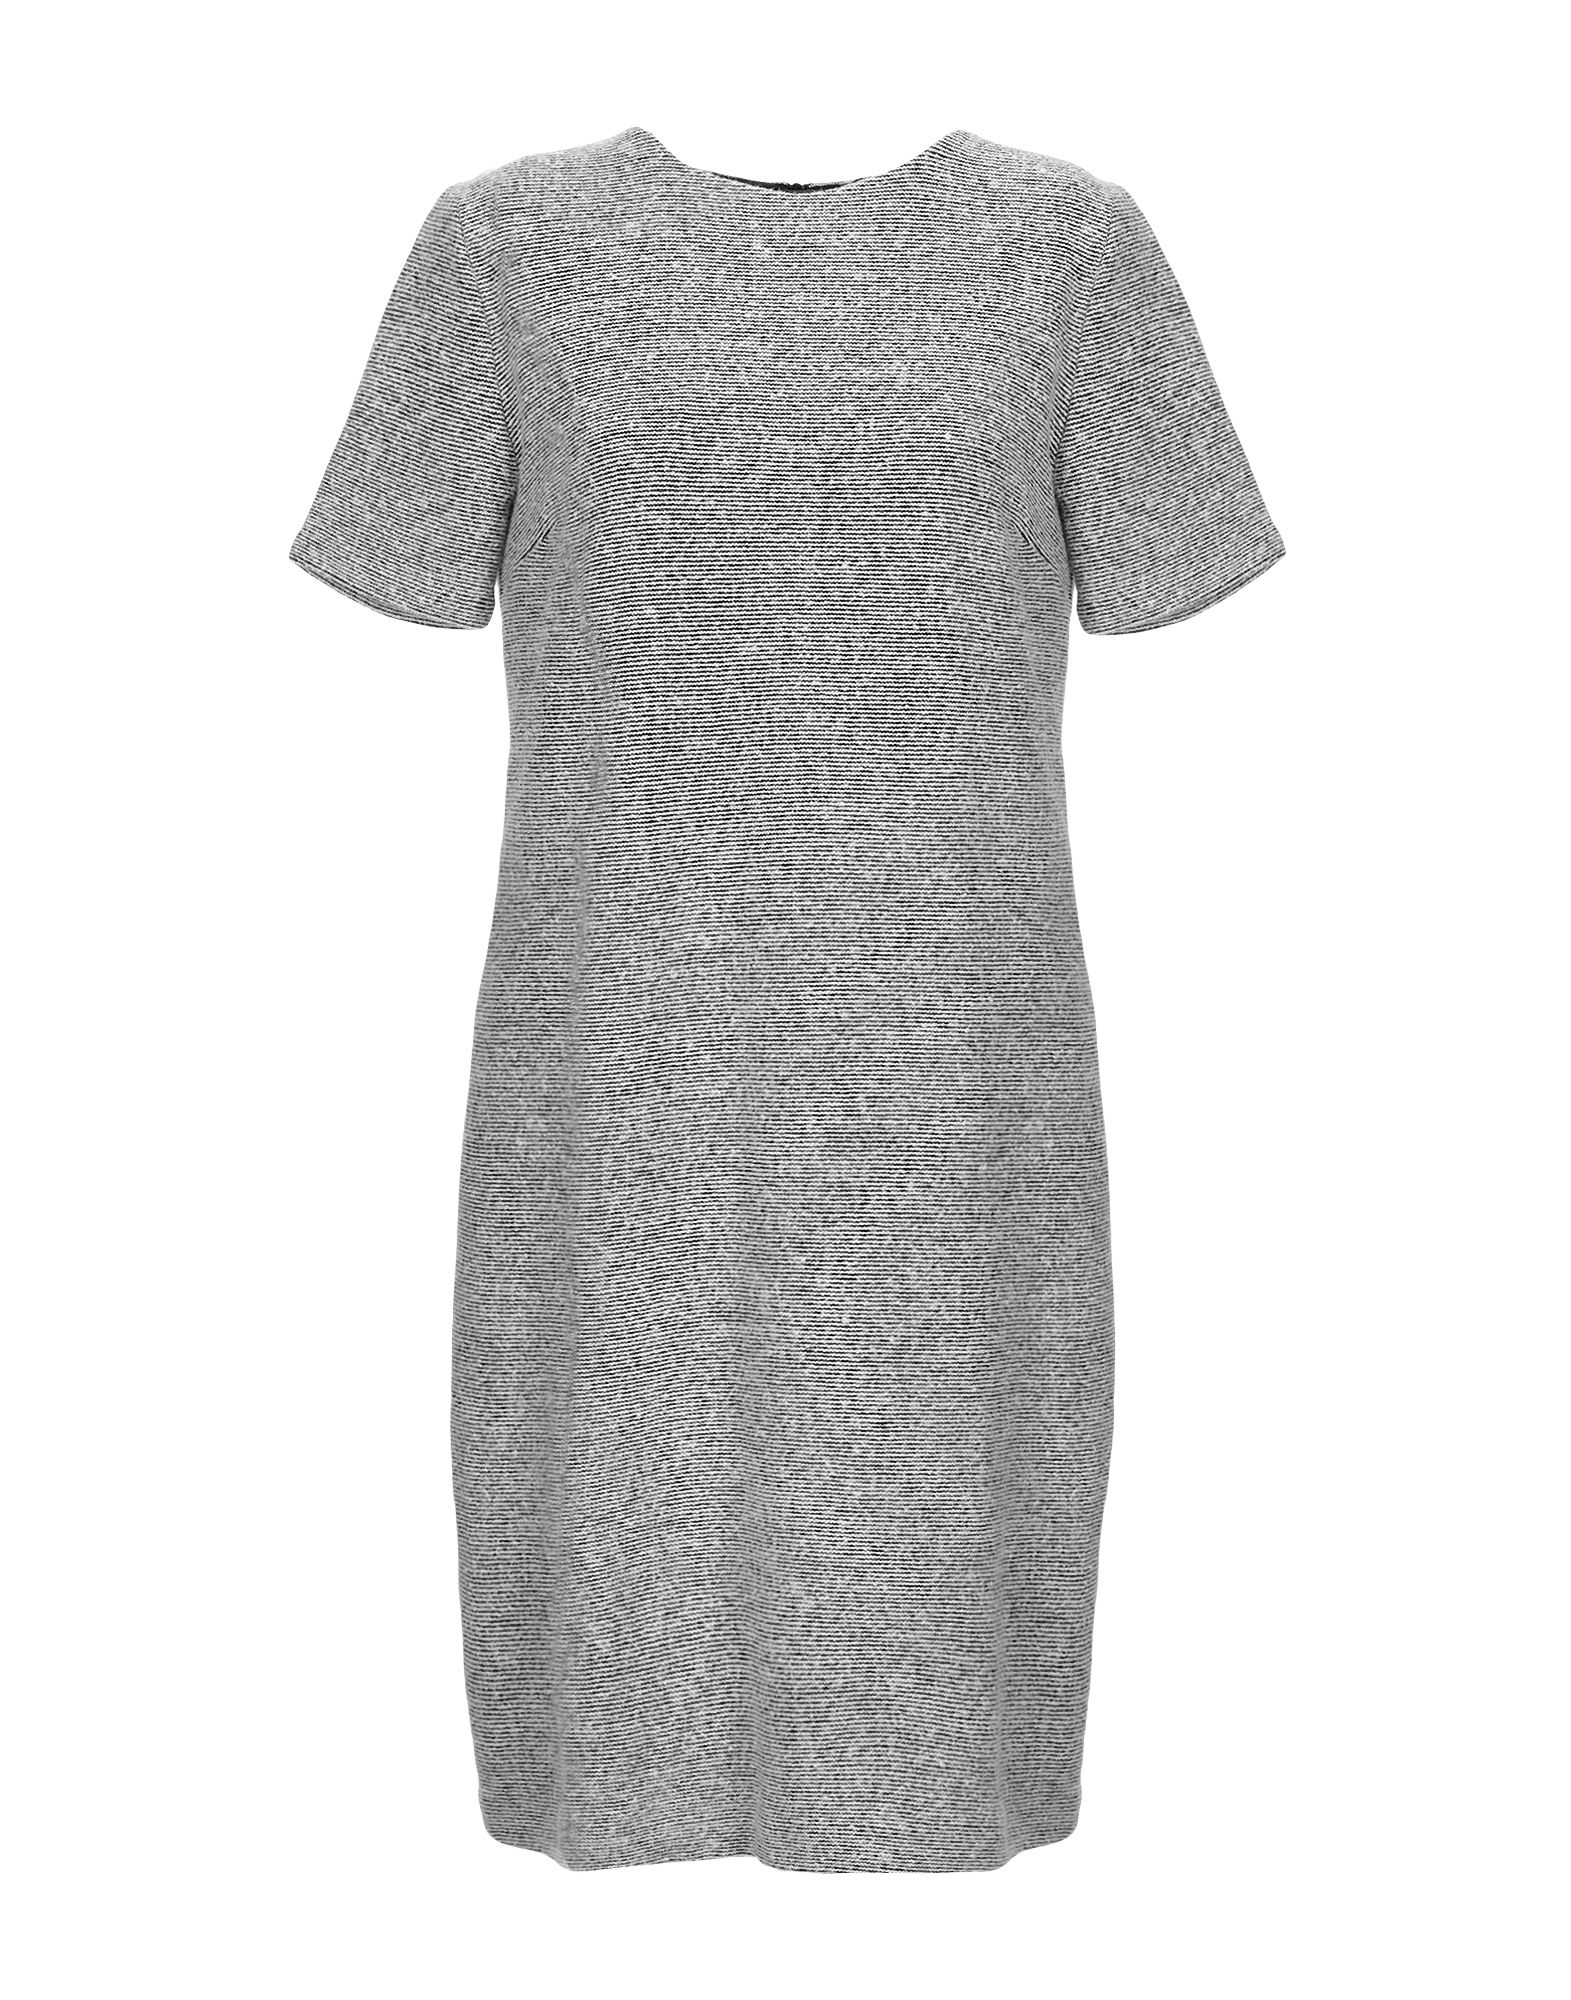 AMINA RUBINACCI Короткое платье amina rubinacci однотонные шорты